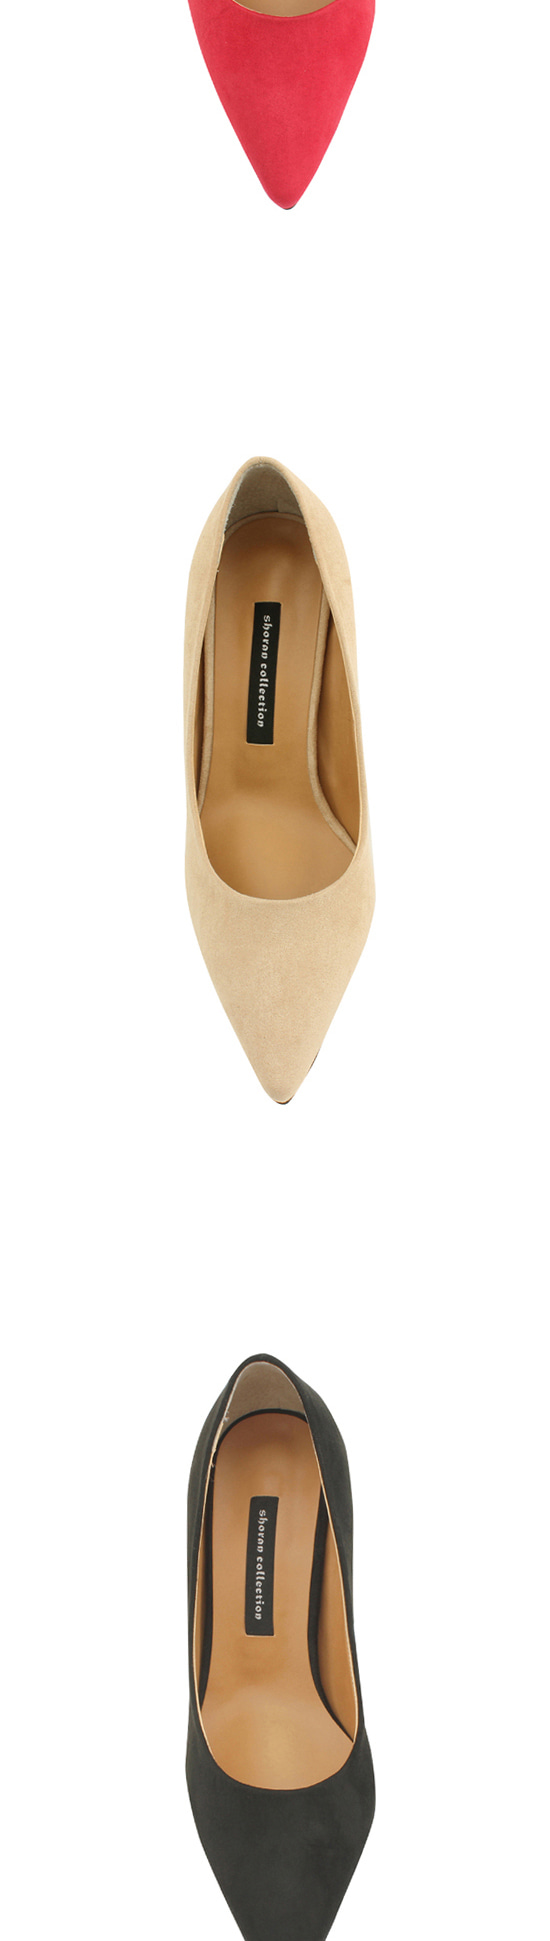 Suede Pointed Nose High Heels 7cm Jean Beige